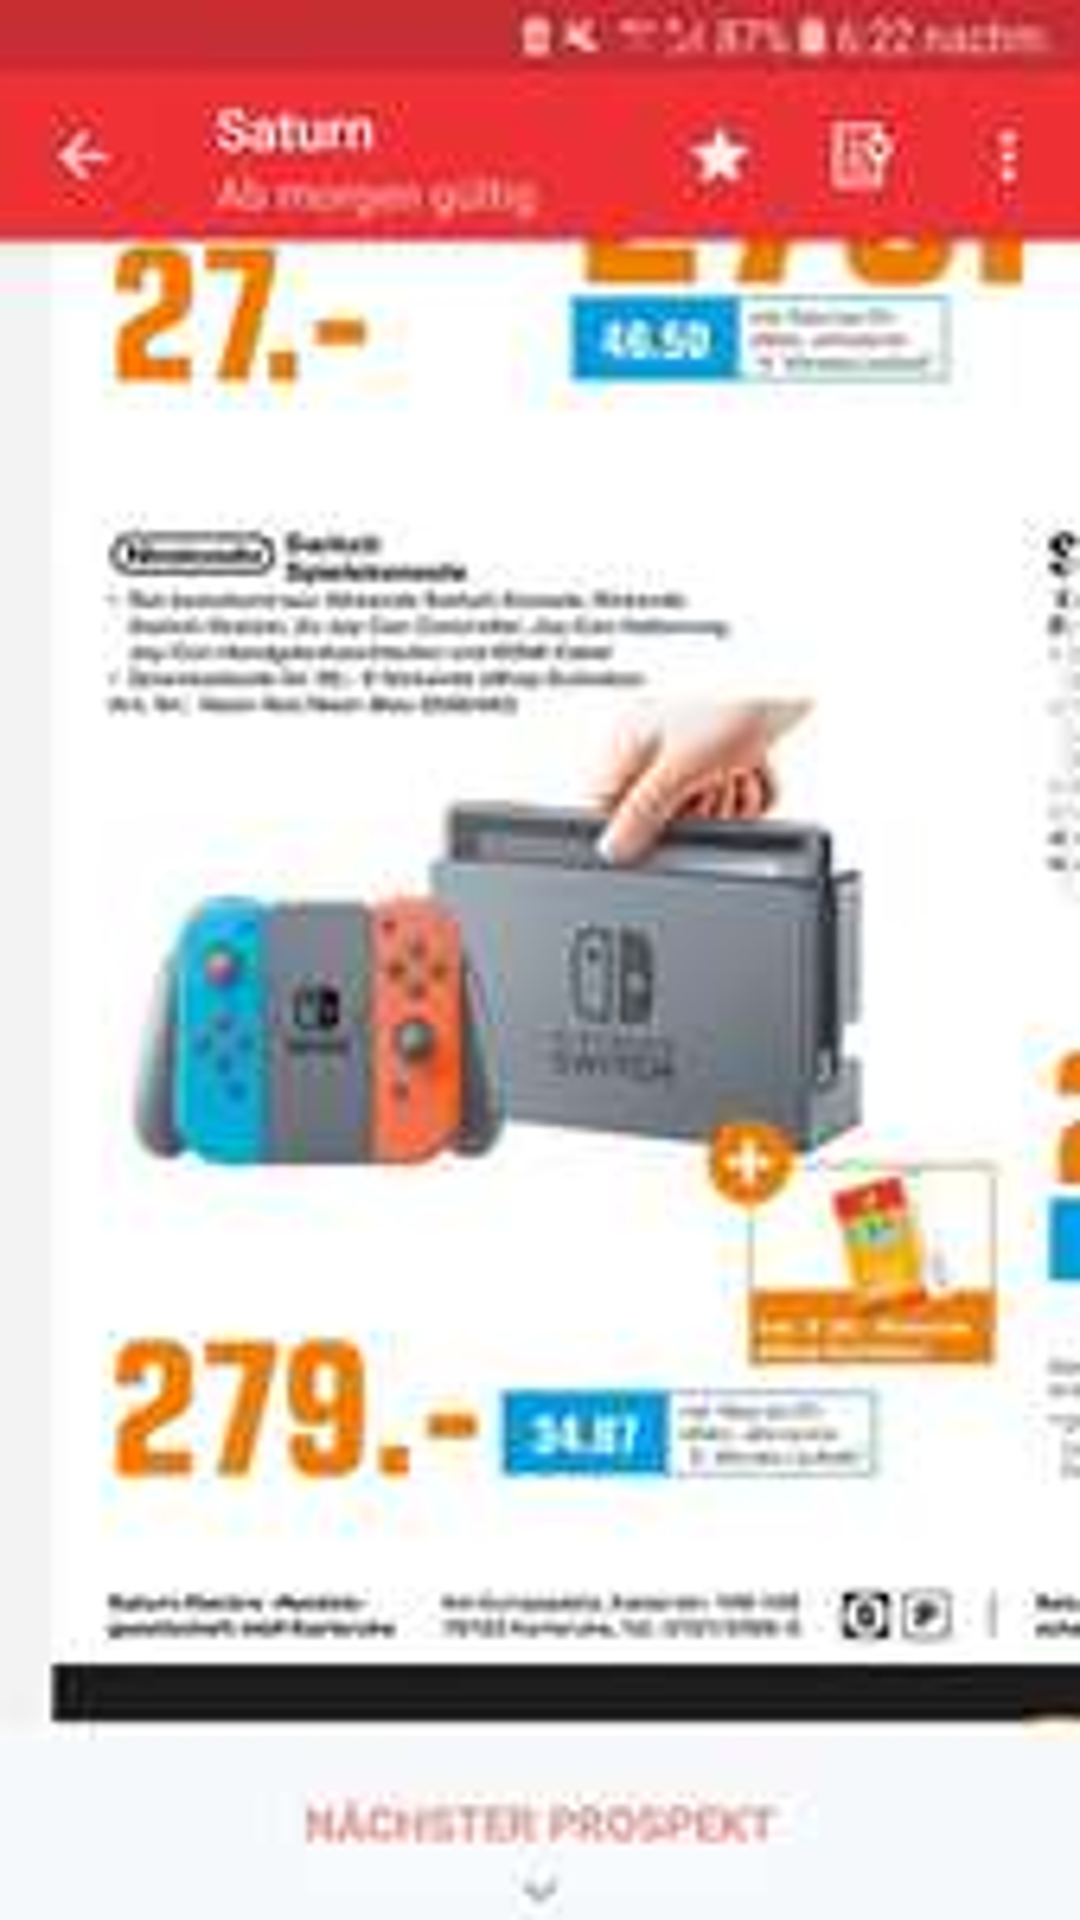 [LOKAL] Karlsruhe/Heidelberg/Pforzheim Saturn Nintendo Switch